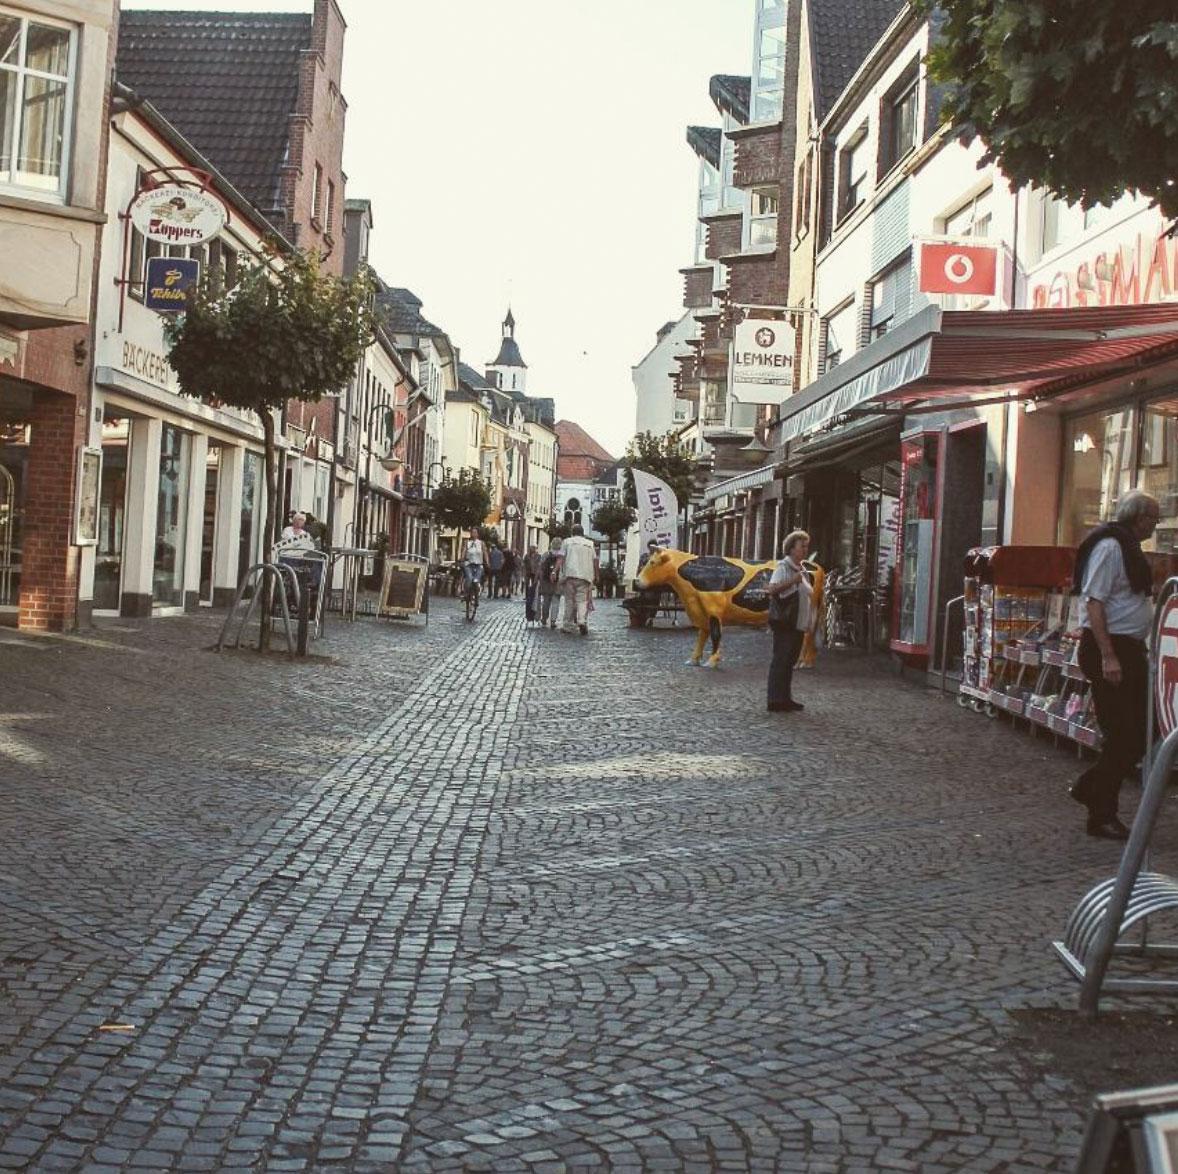 Streets of Xanten, Germany